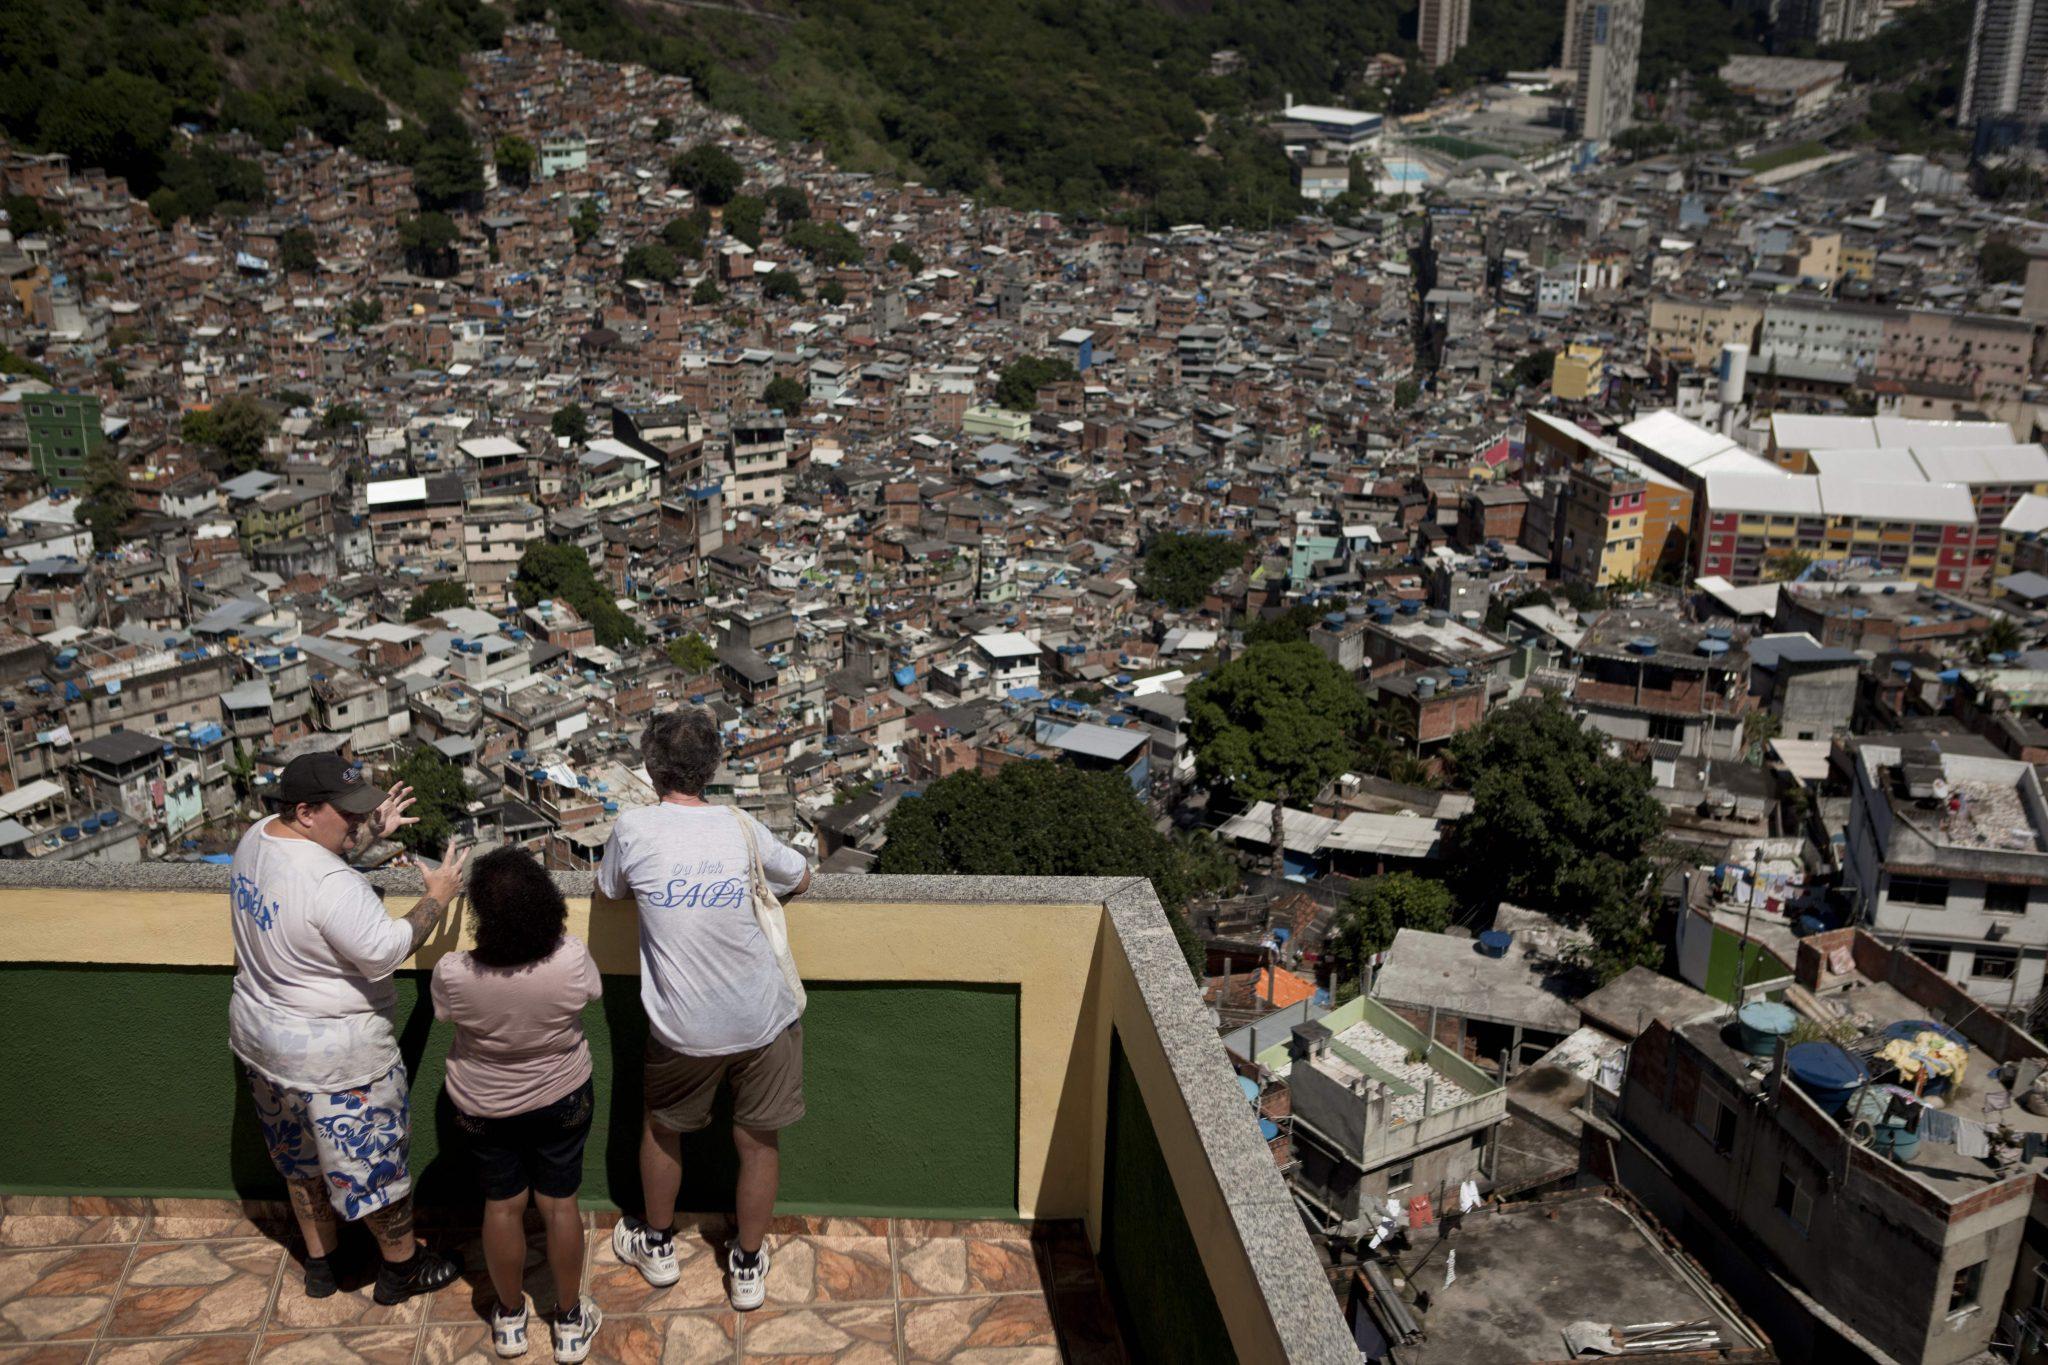 A Debate On The Popularity Of Slum Tourism